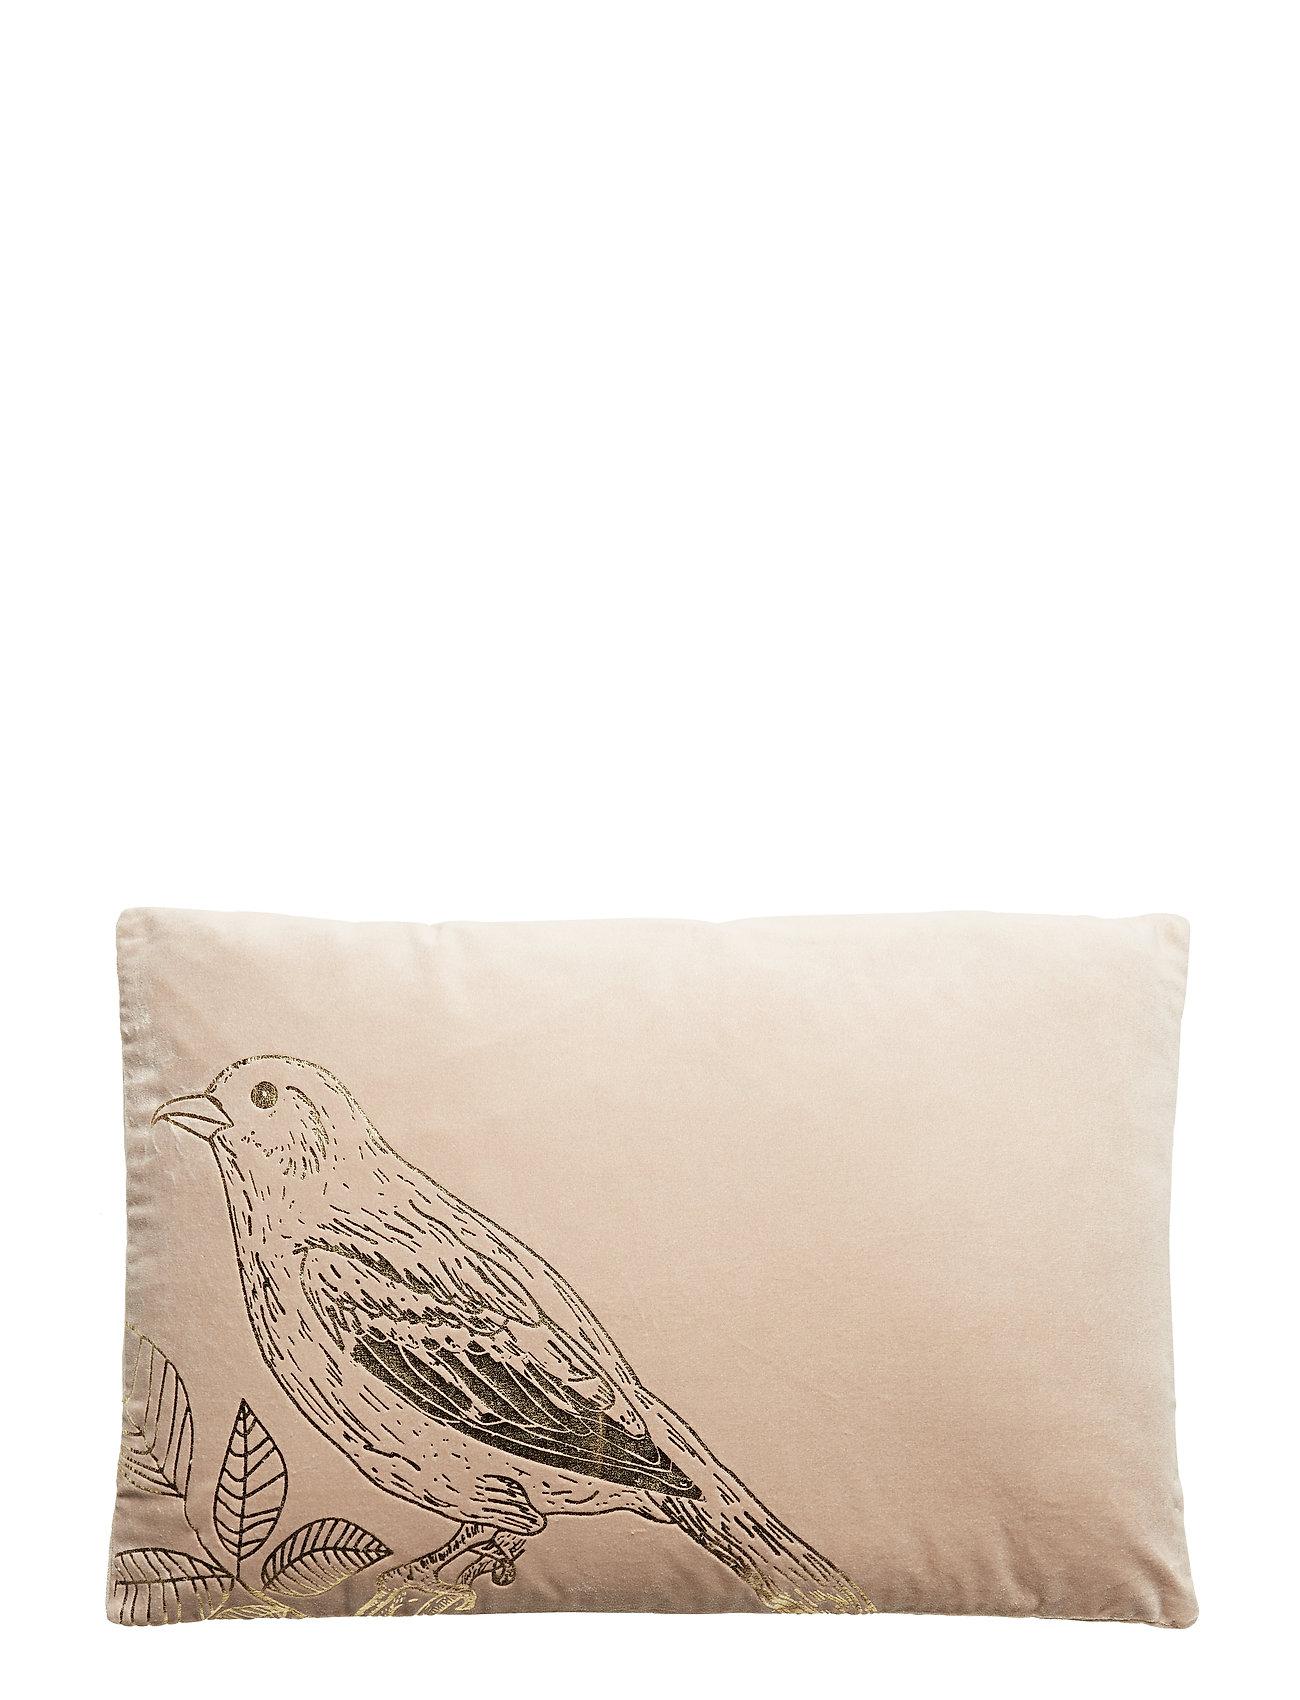 Bloomingville Cushion, Nature, Cotton - NATURE